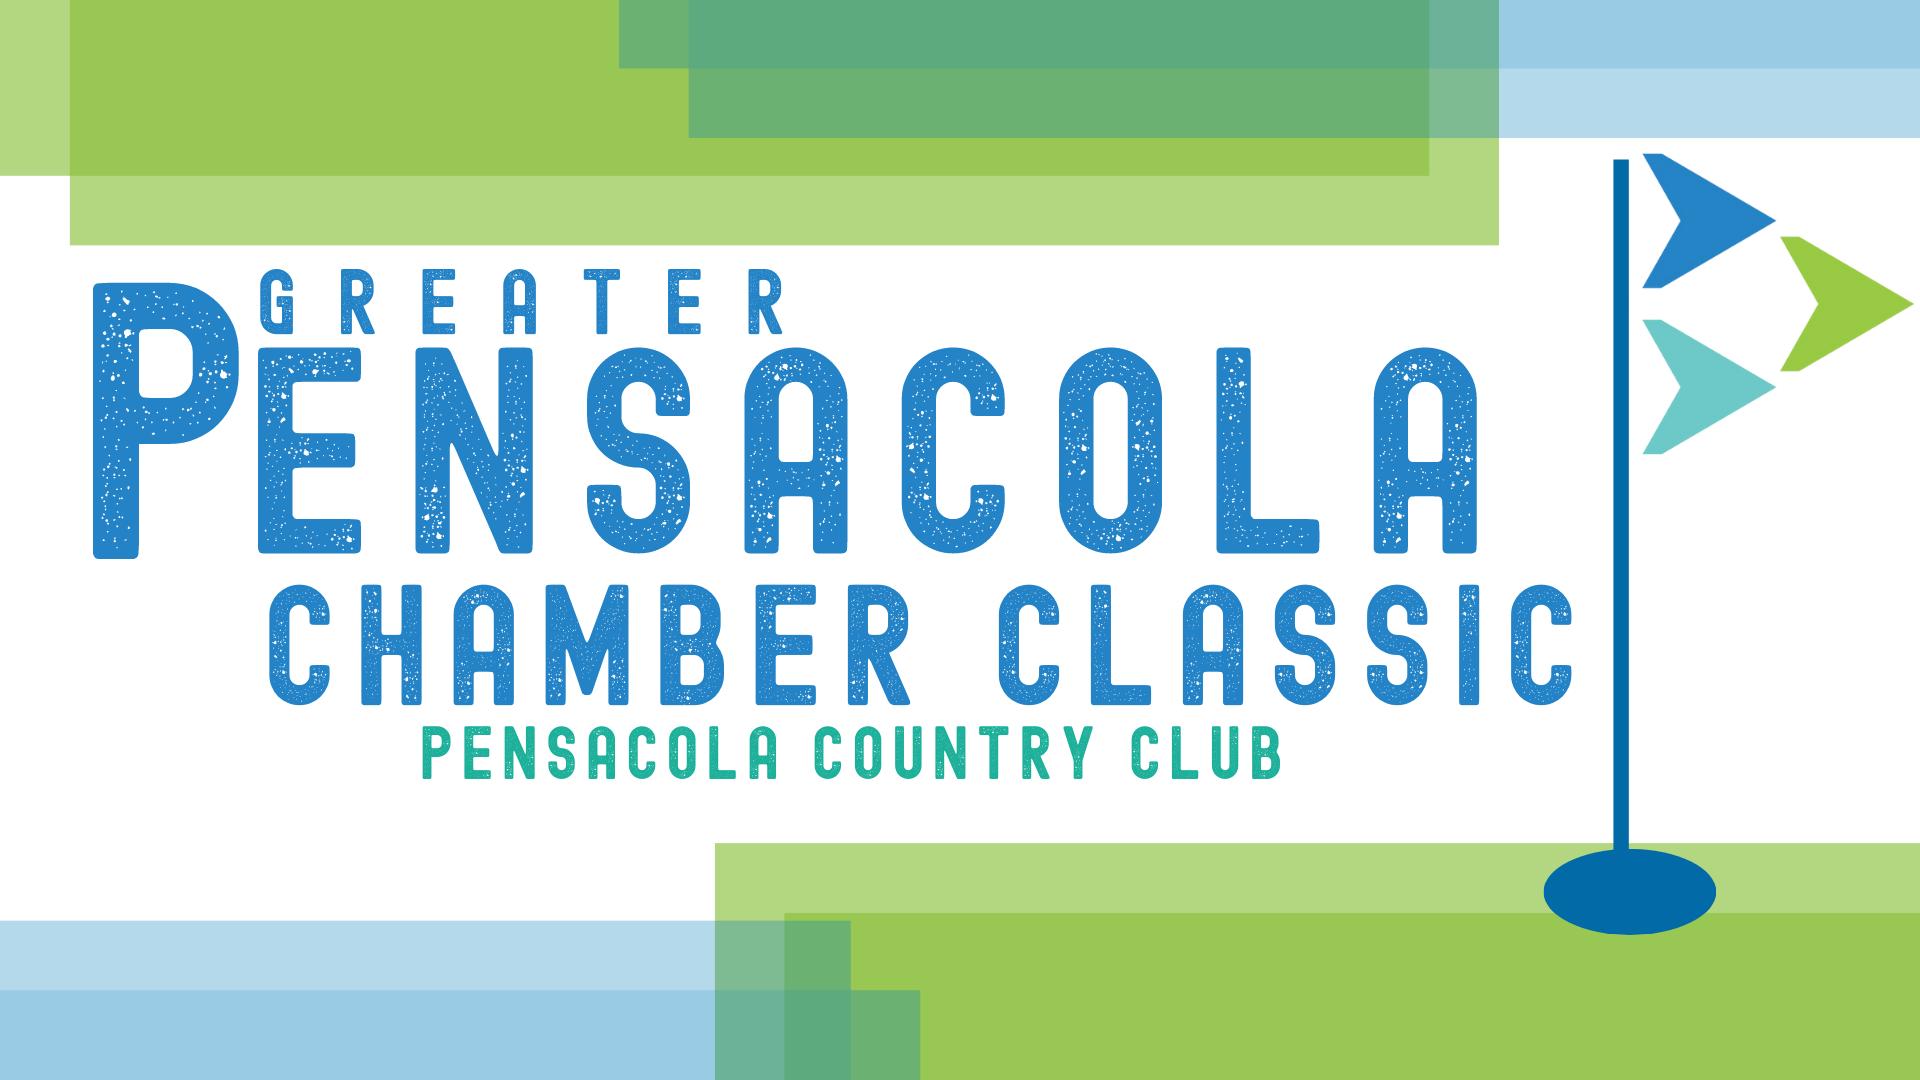 2022 Chamber Classic Golf Tournament